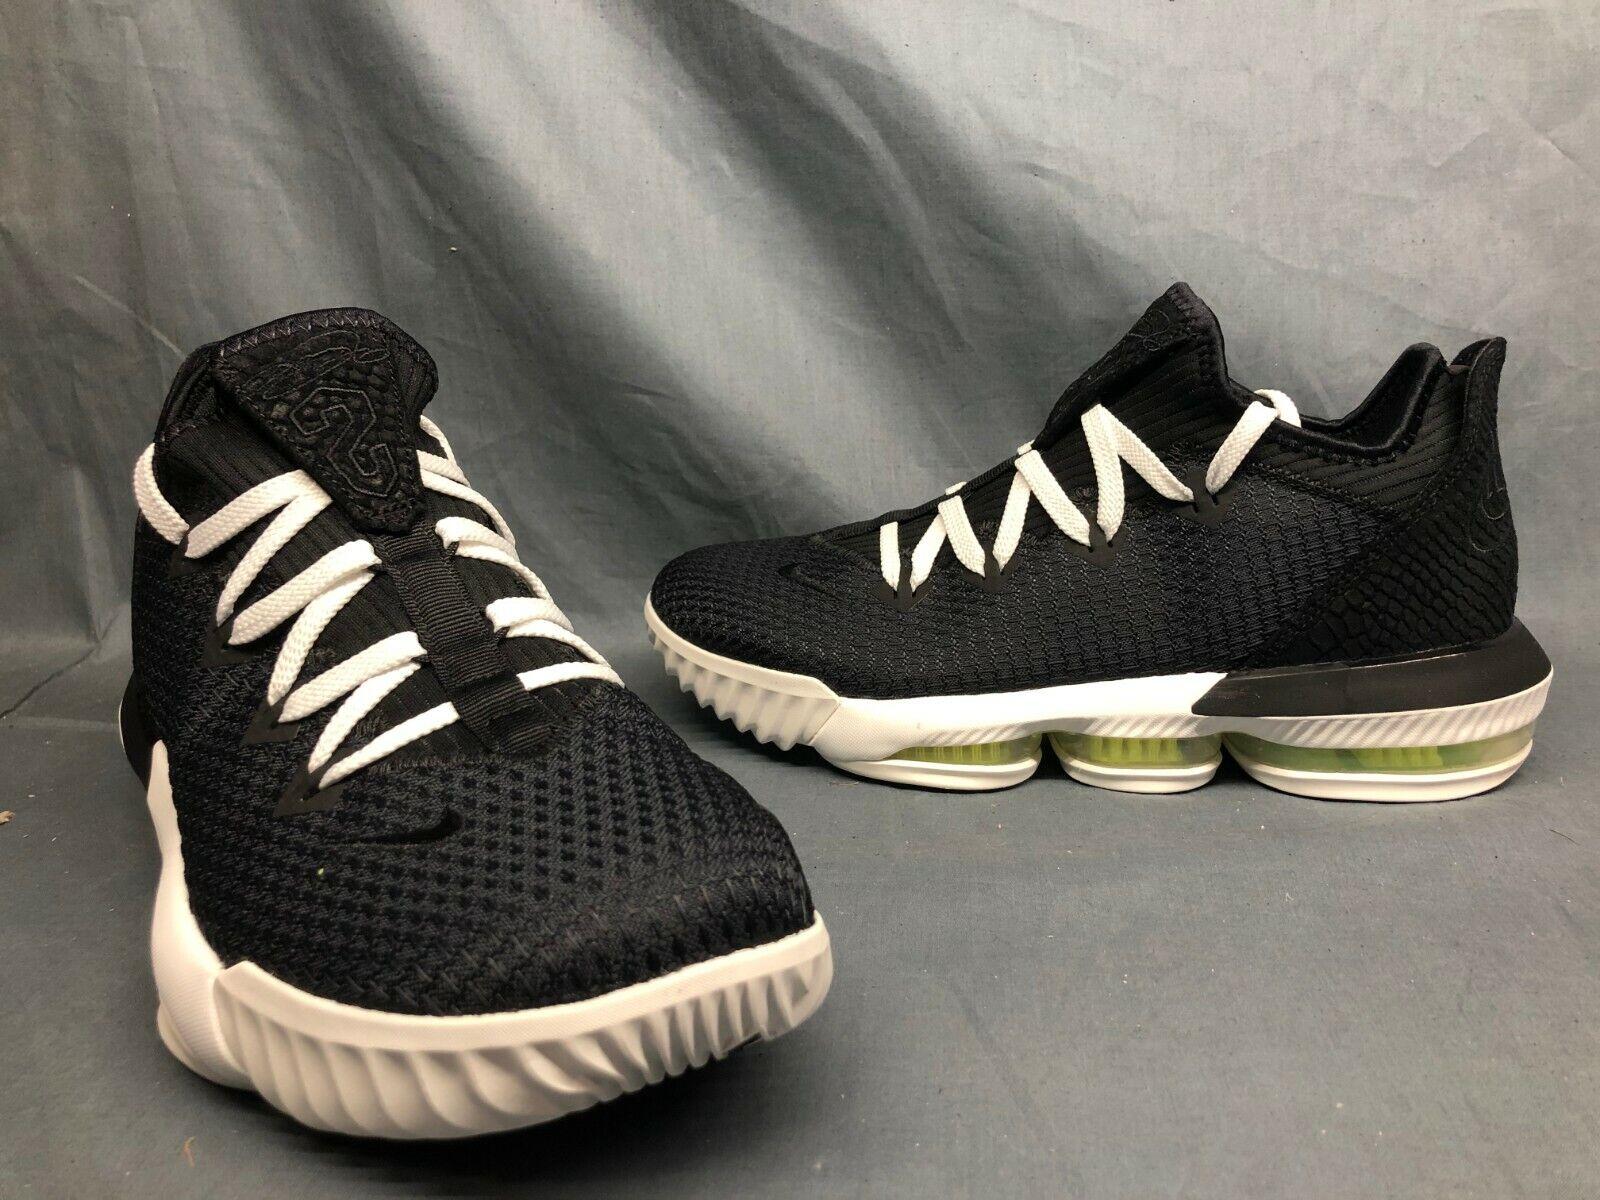 Nike Lebron XVI Basketball Shoes for Men, Size 10 - Black/Black-Summit  White-Volt